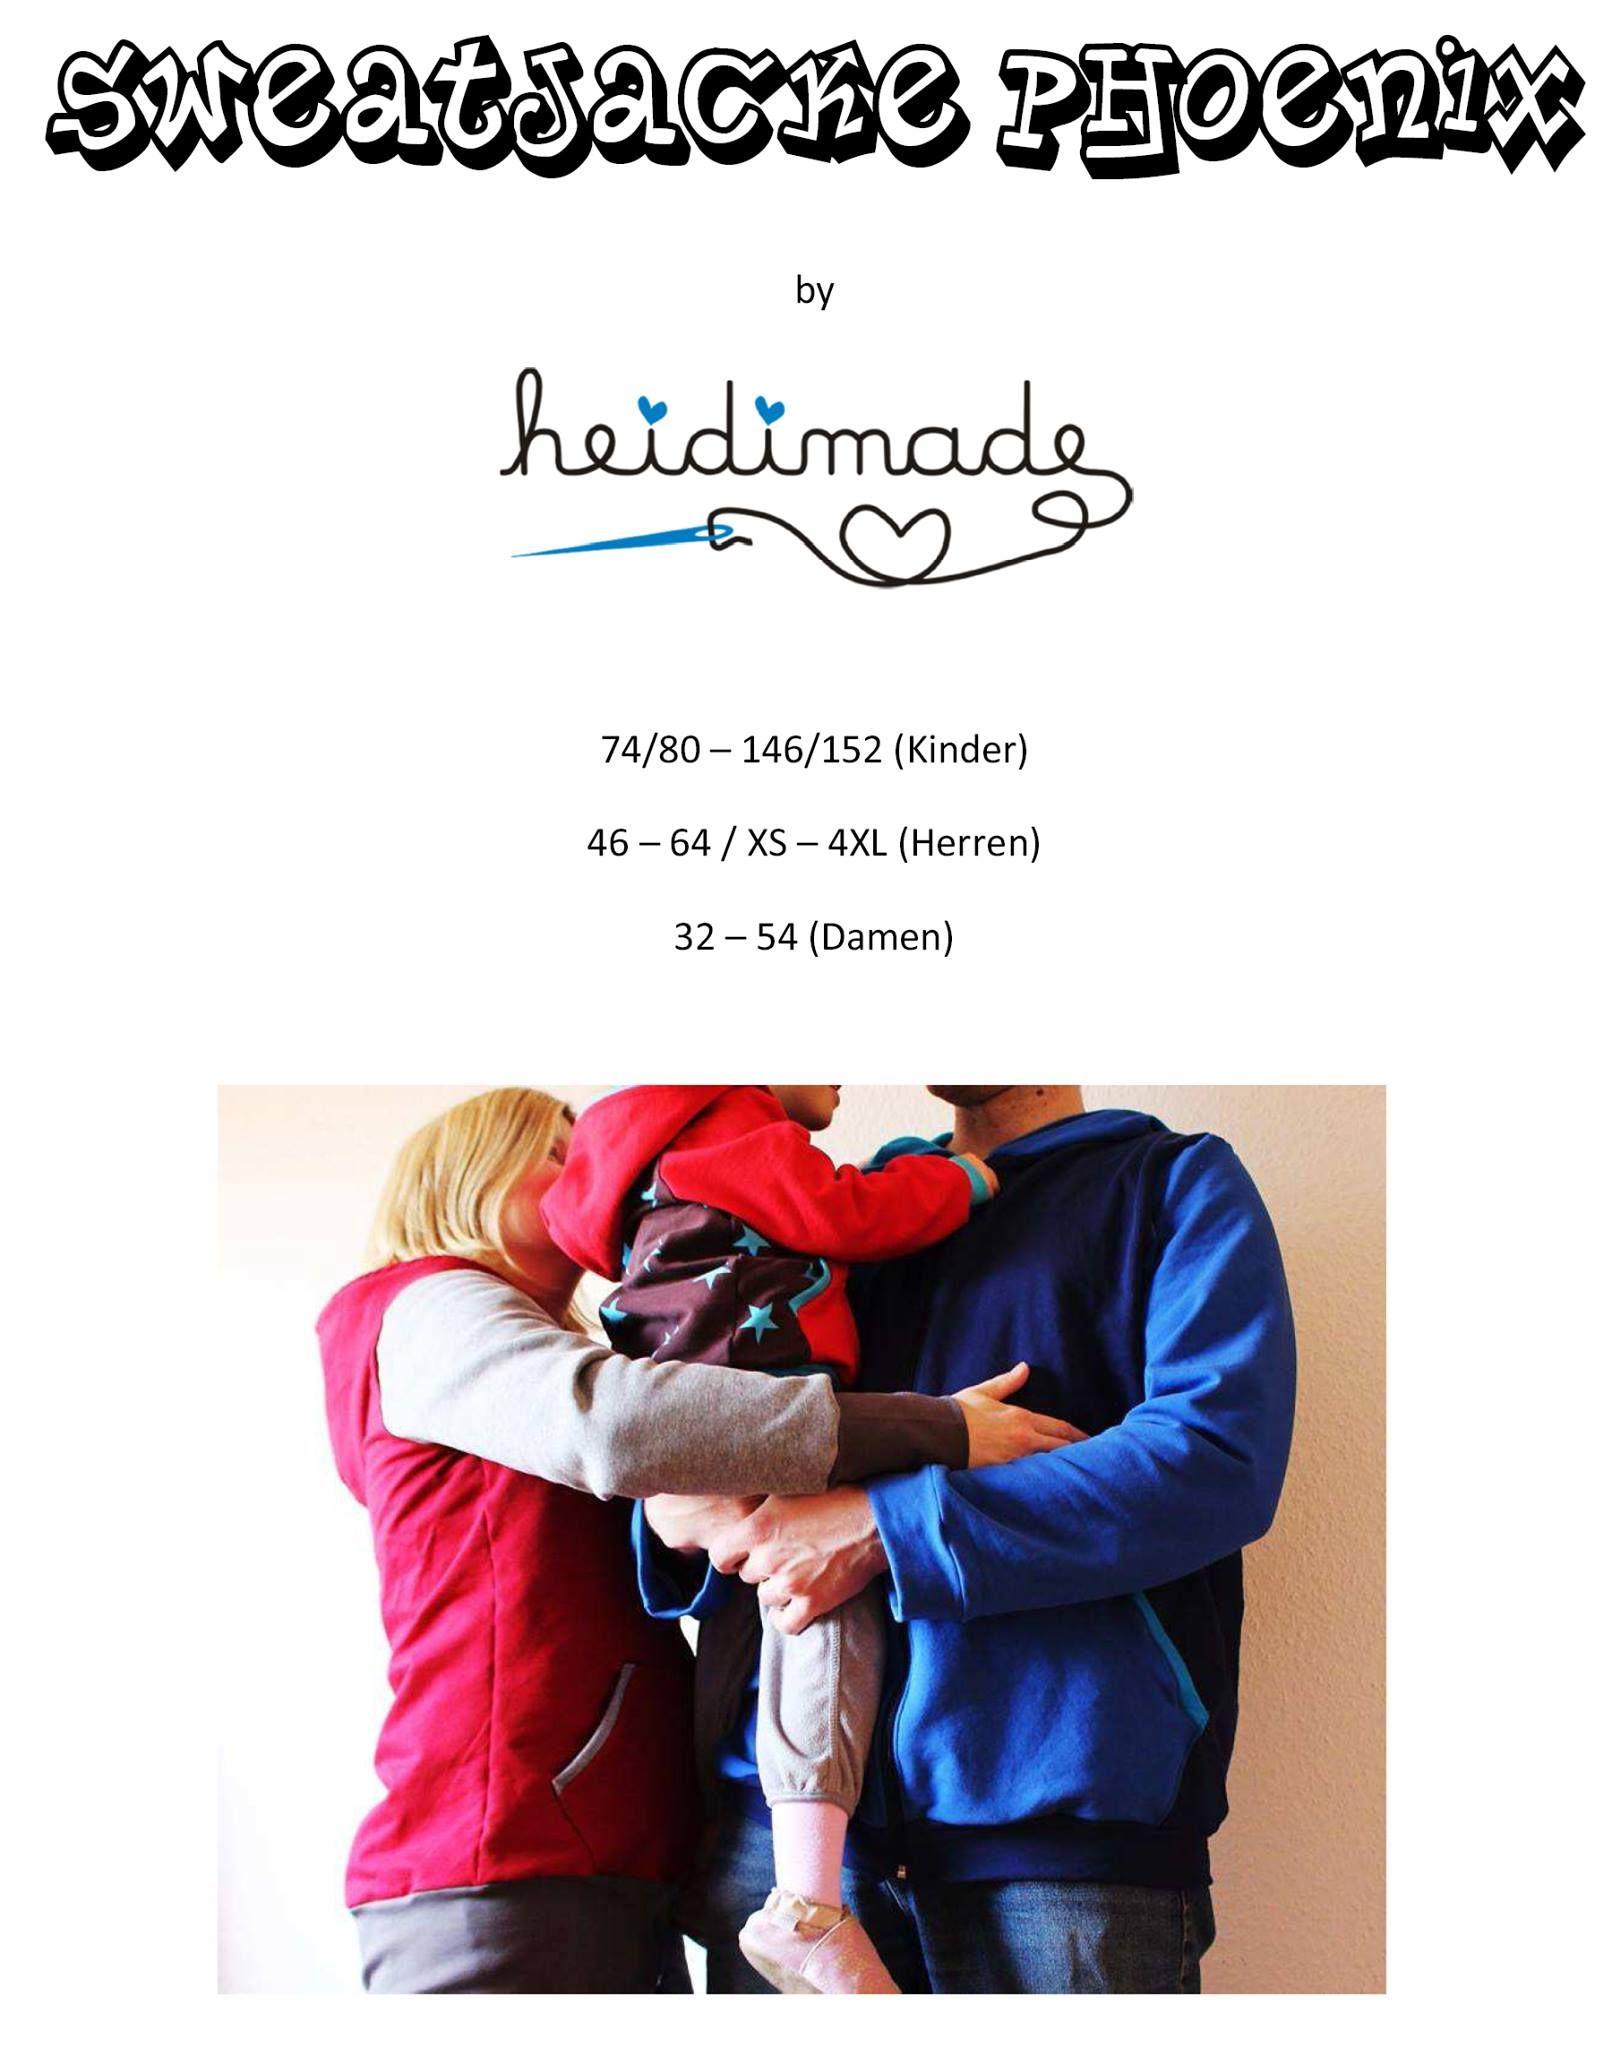 Heidimade: Sweatjacke Phoenix Größe 46-64/XS-4XL | Herren ...